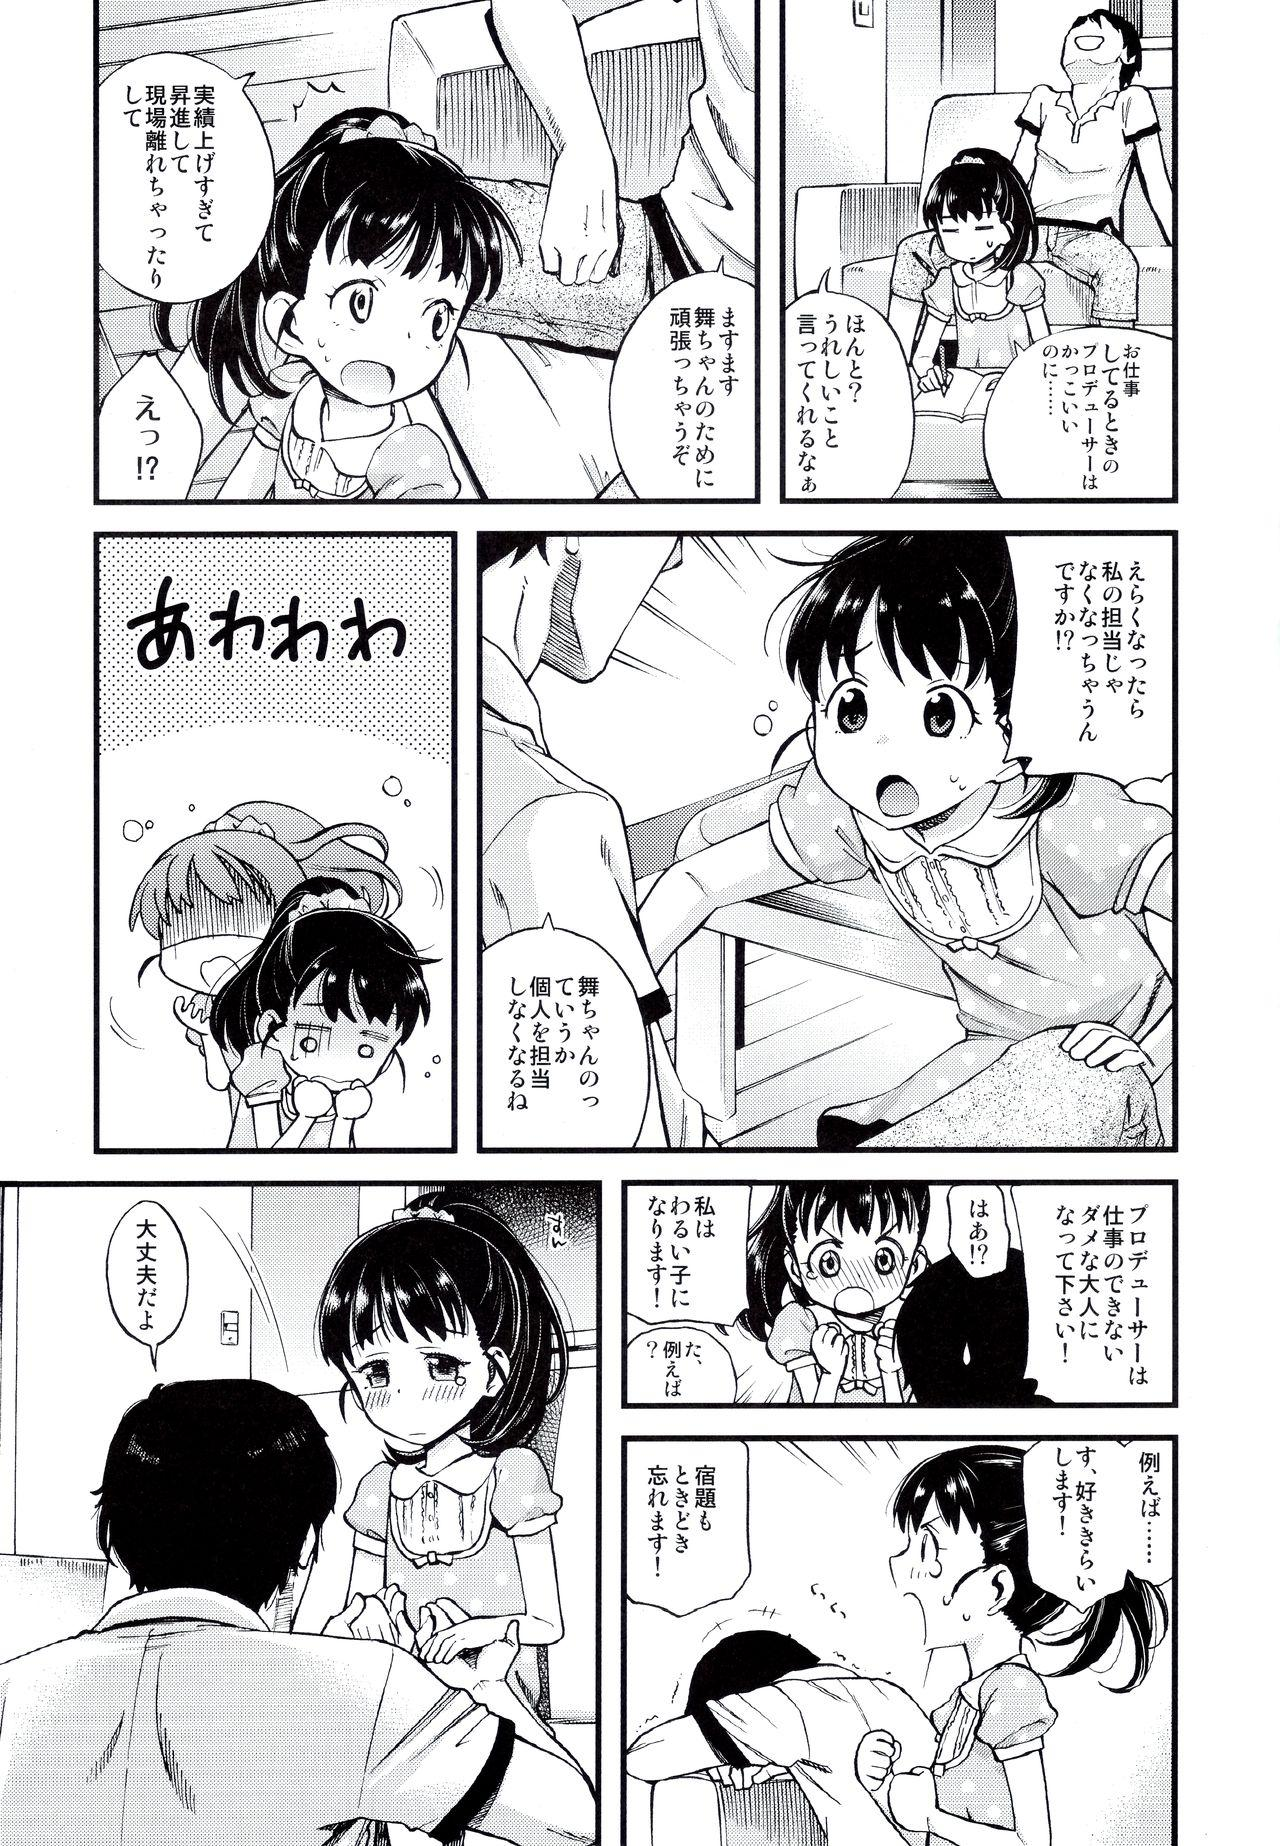 Warui Ko Mai-chan 5